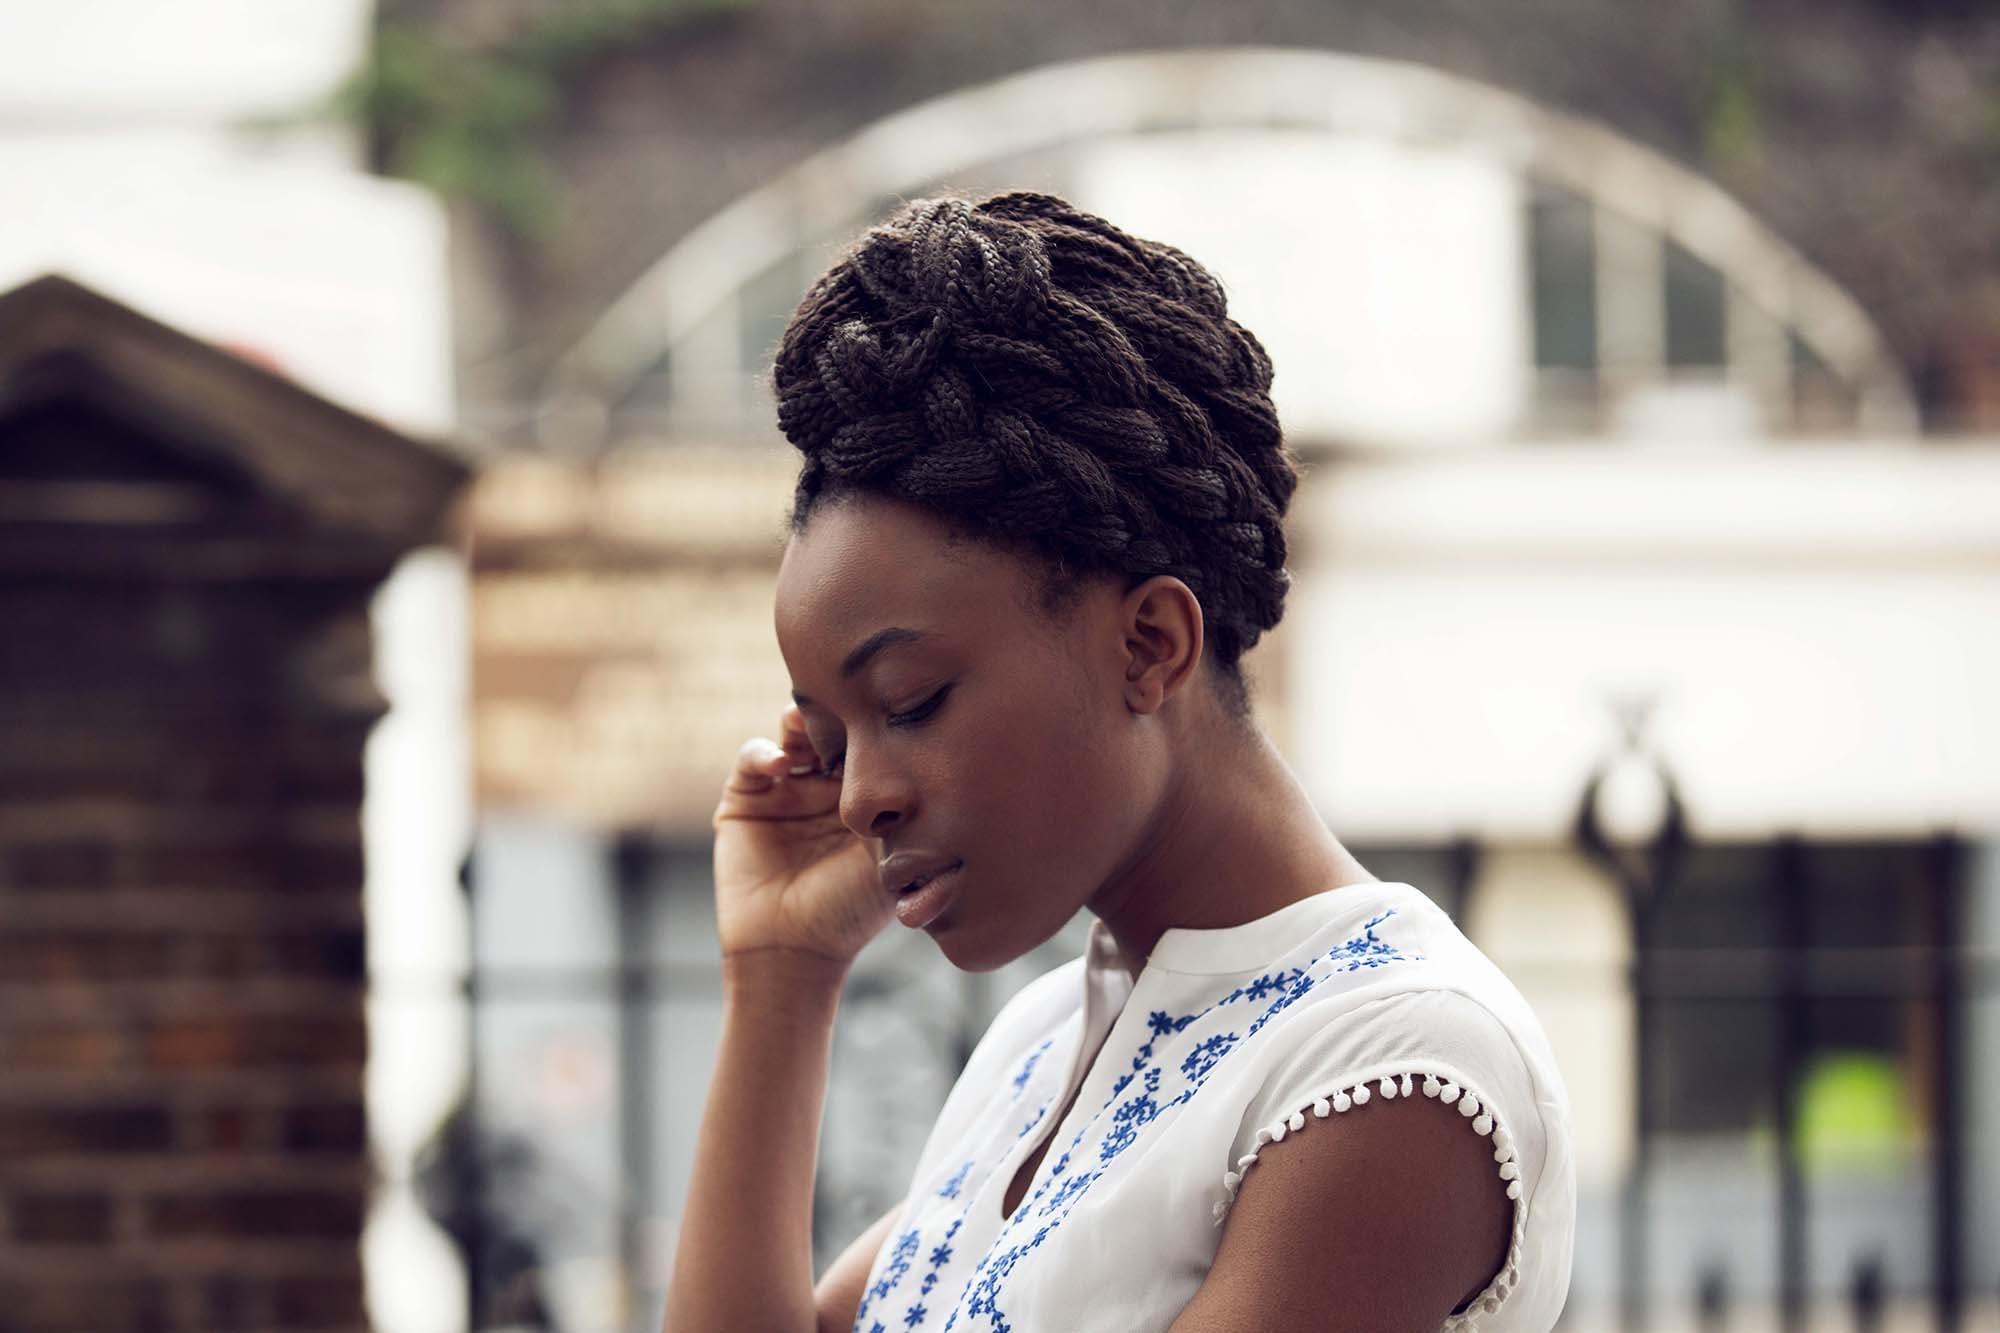 Stunning hairstyles Braided Crowns